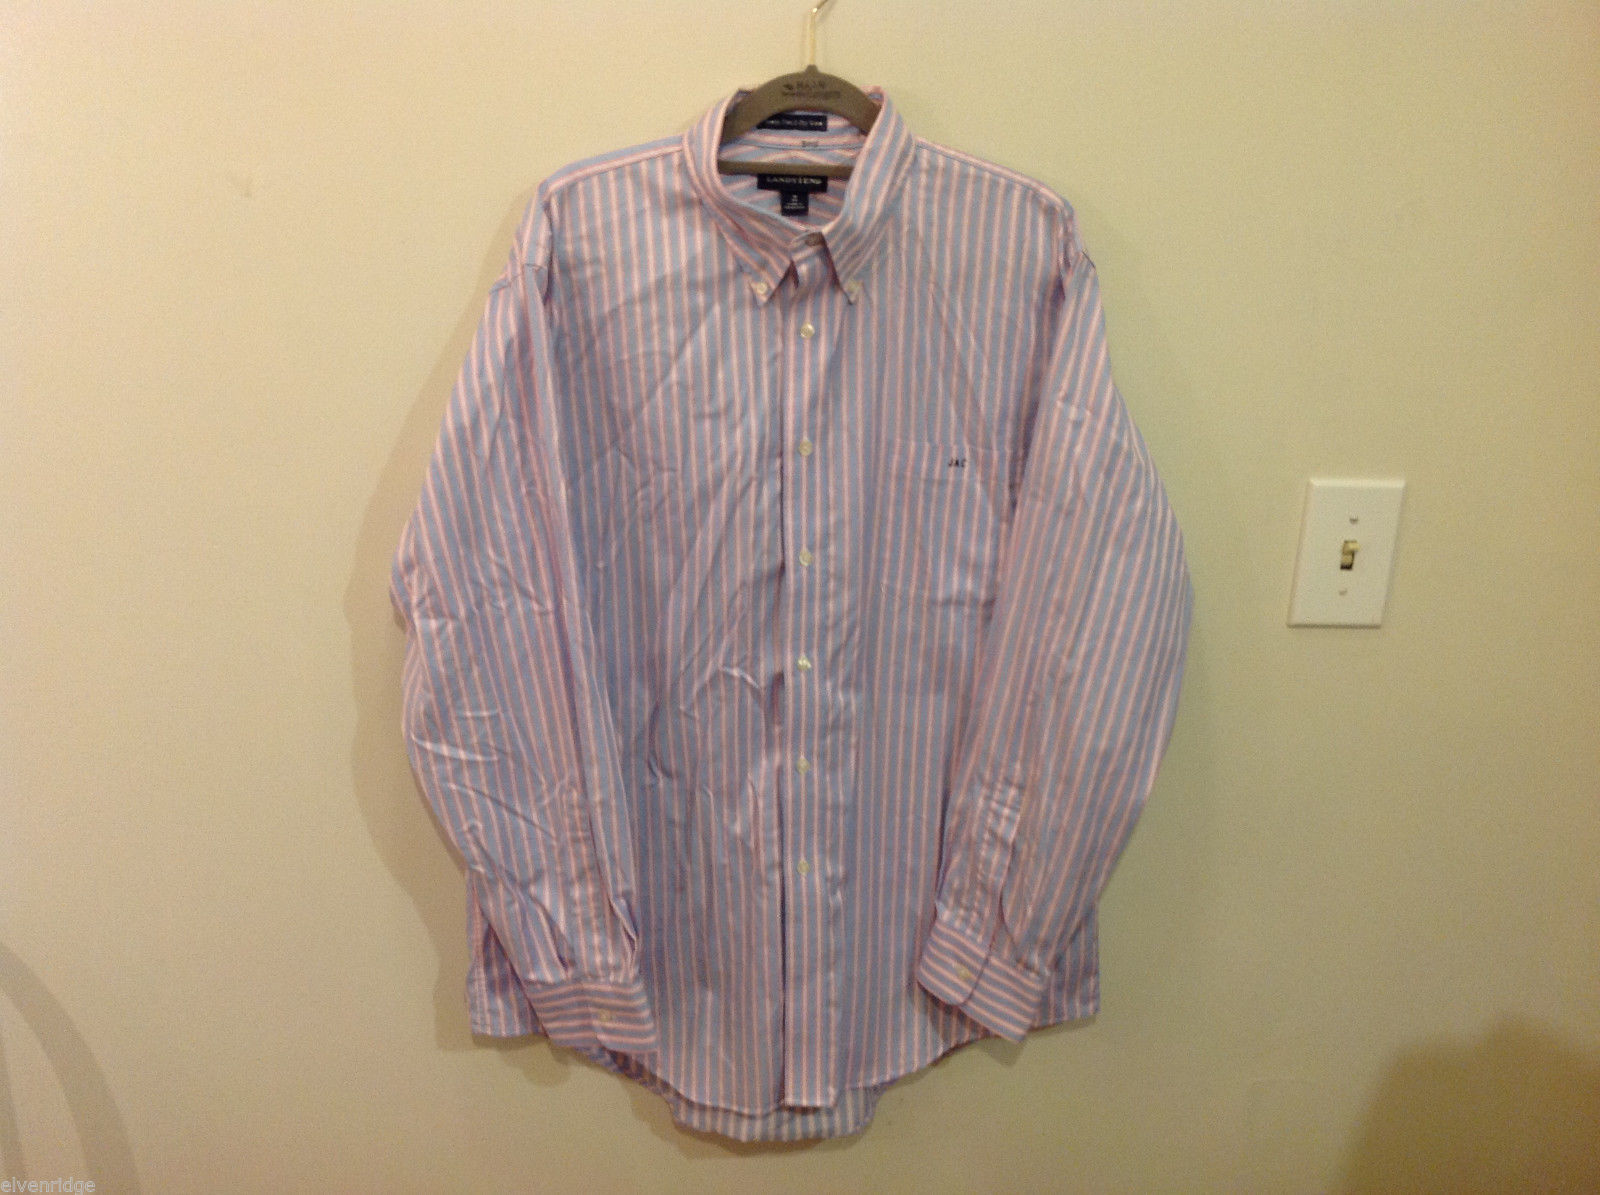 Lands End Light Blue Pink White Striped Dress Shirt, Size 16/34